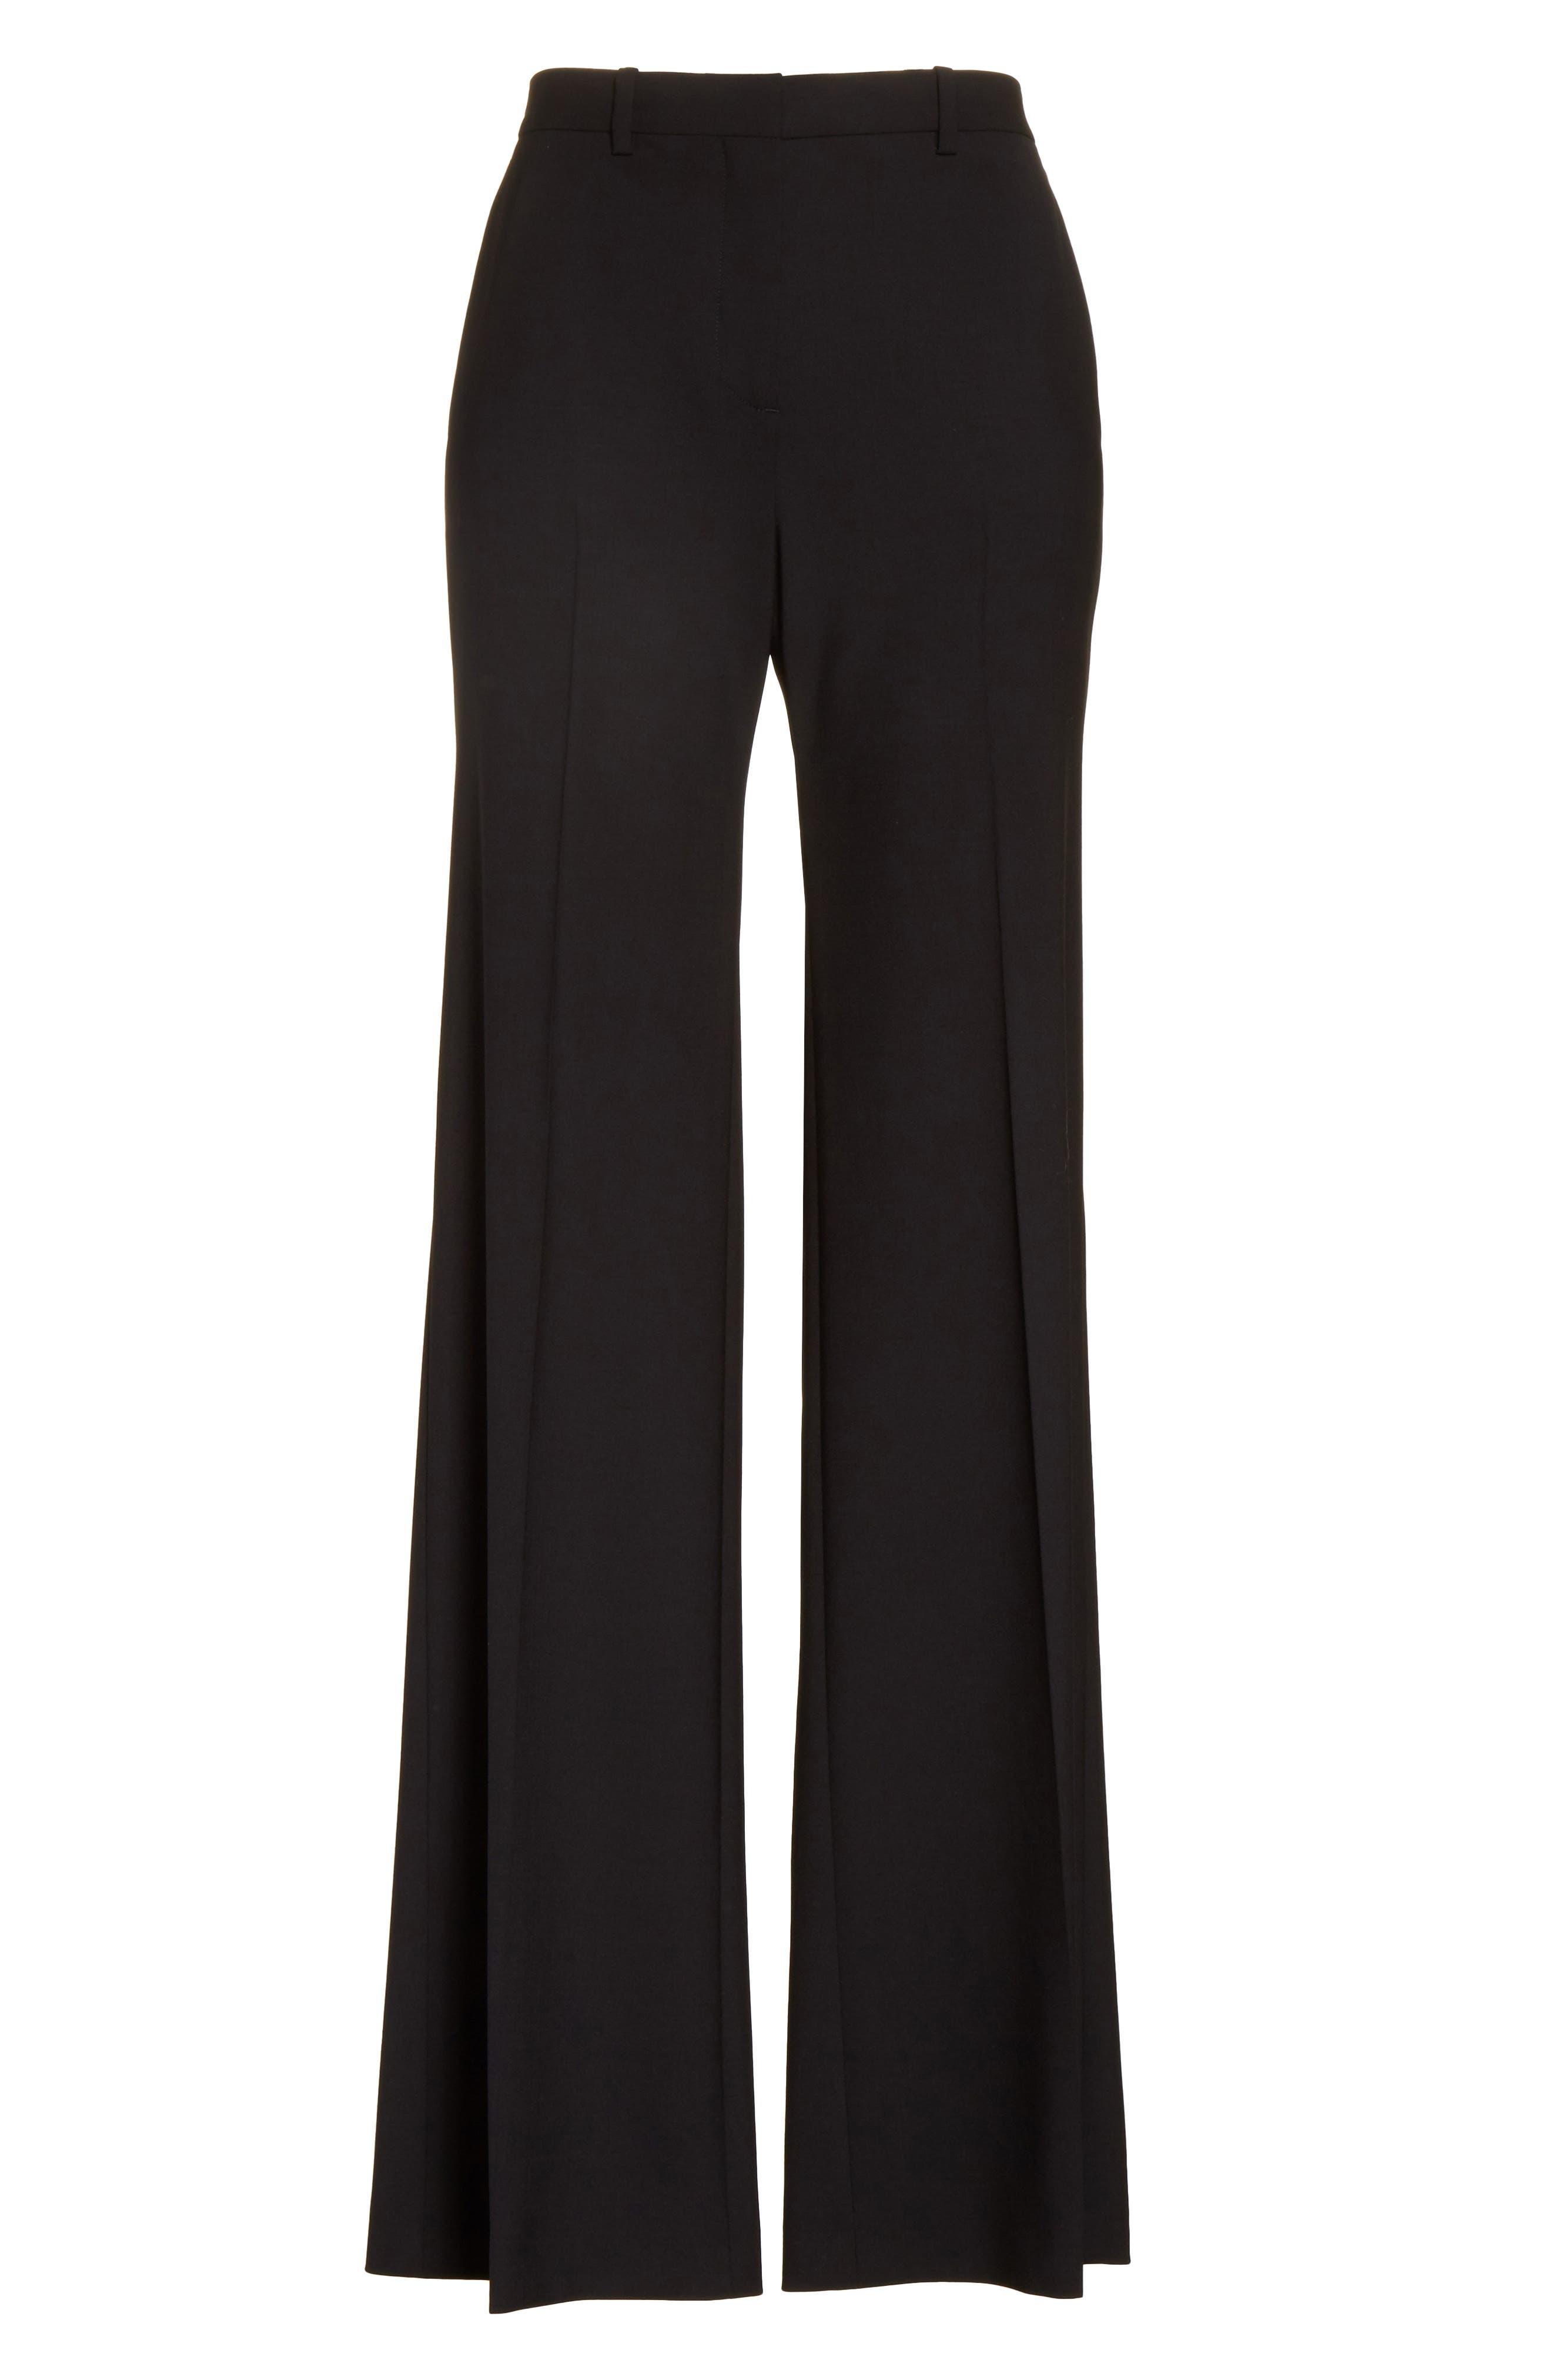 Demetria 2 Flare Leg Good Wool Suit Pants,                             Alternate thumbnail 6, color,                             BLACK